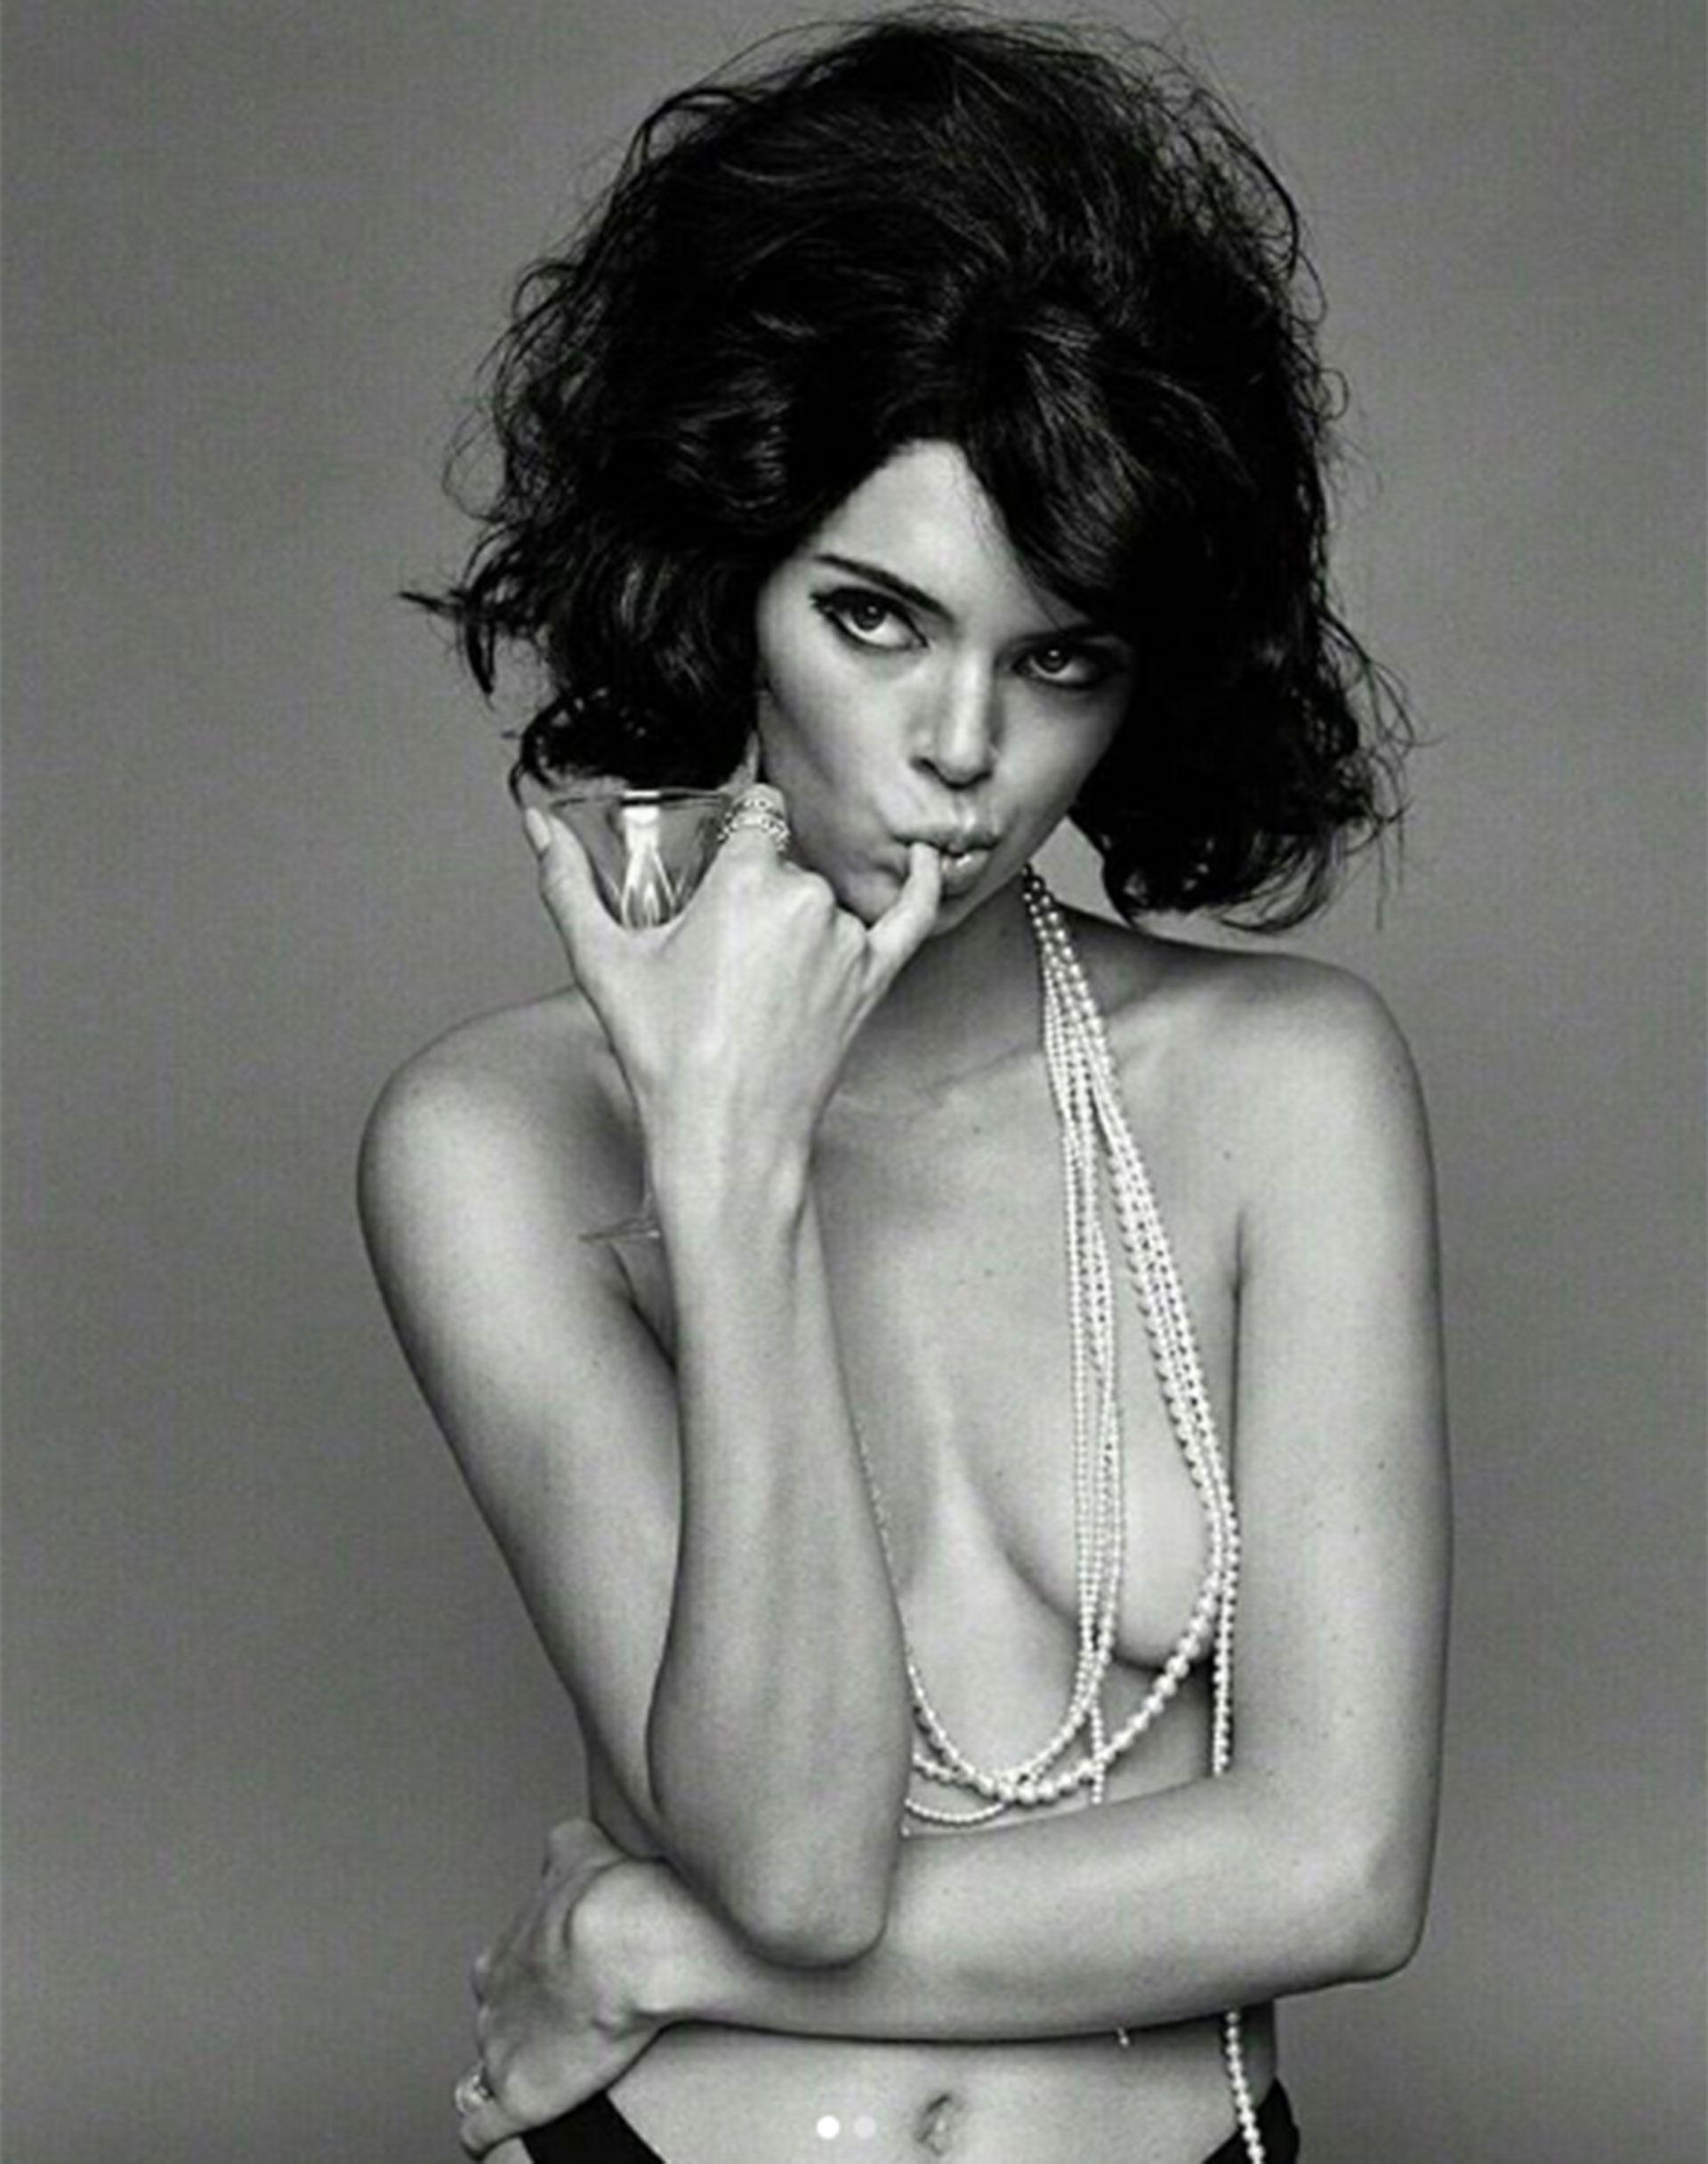 nudes (28 photos), Bikini Celebrity image